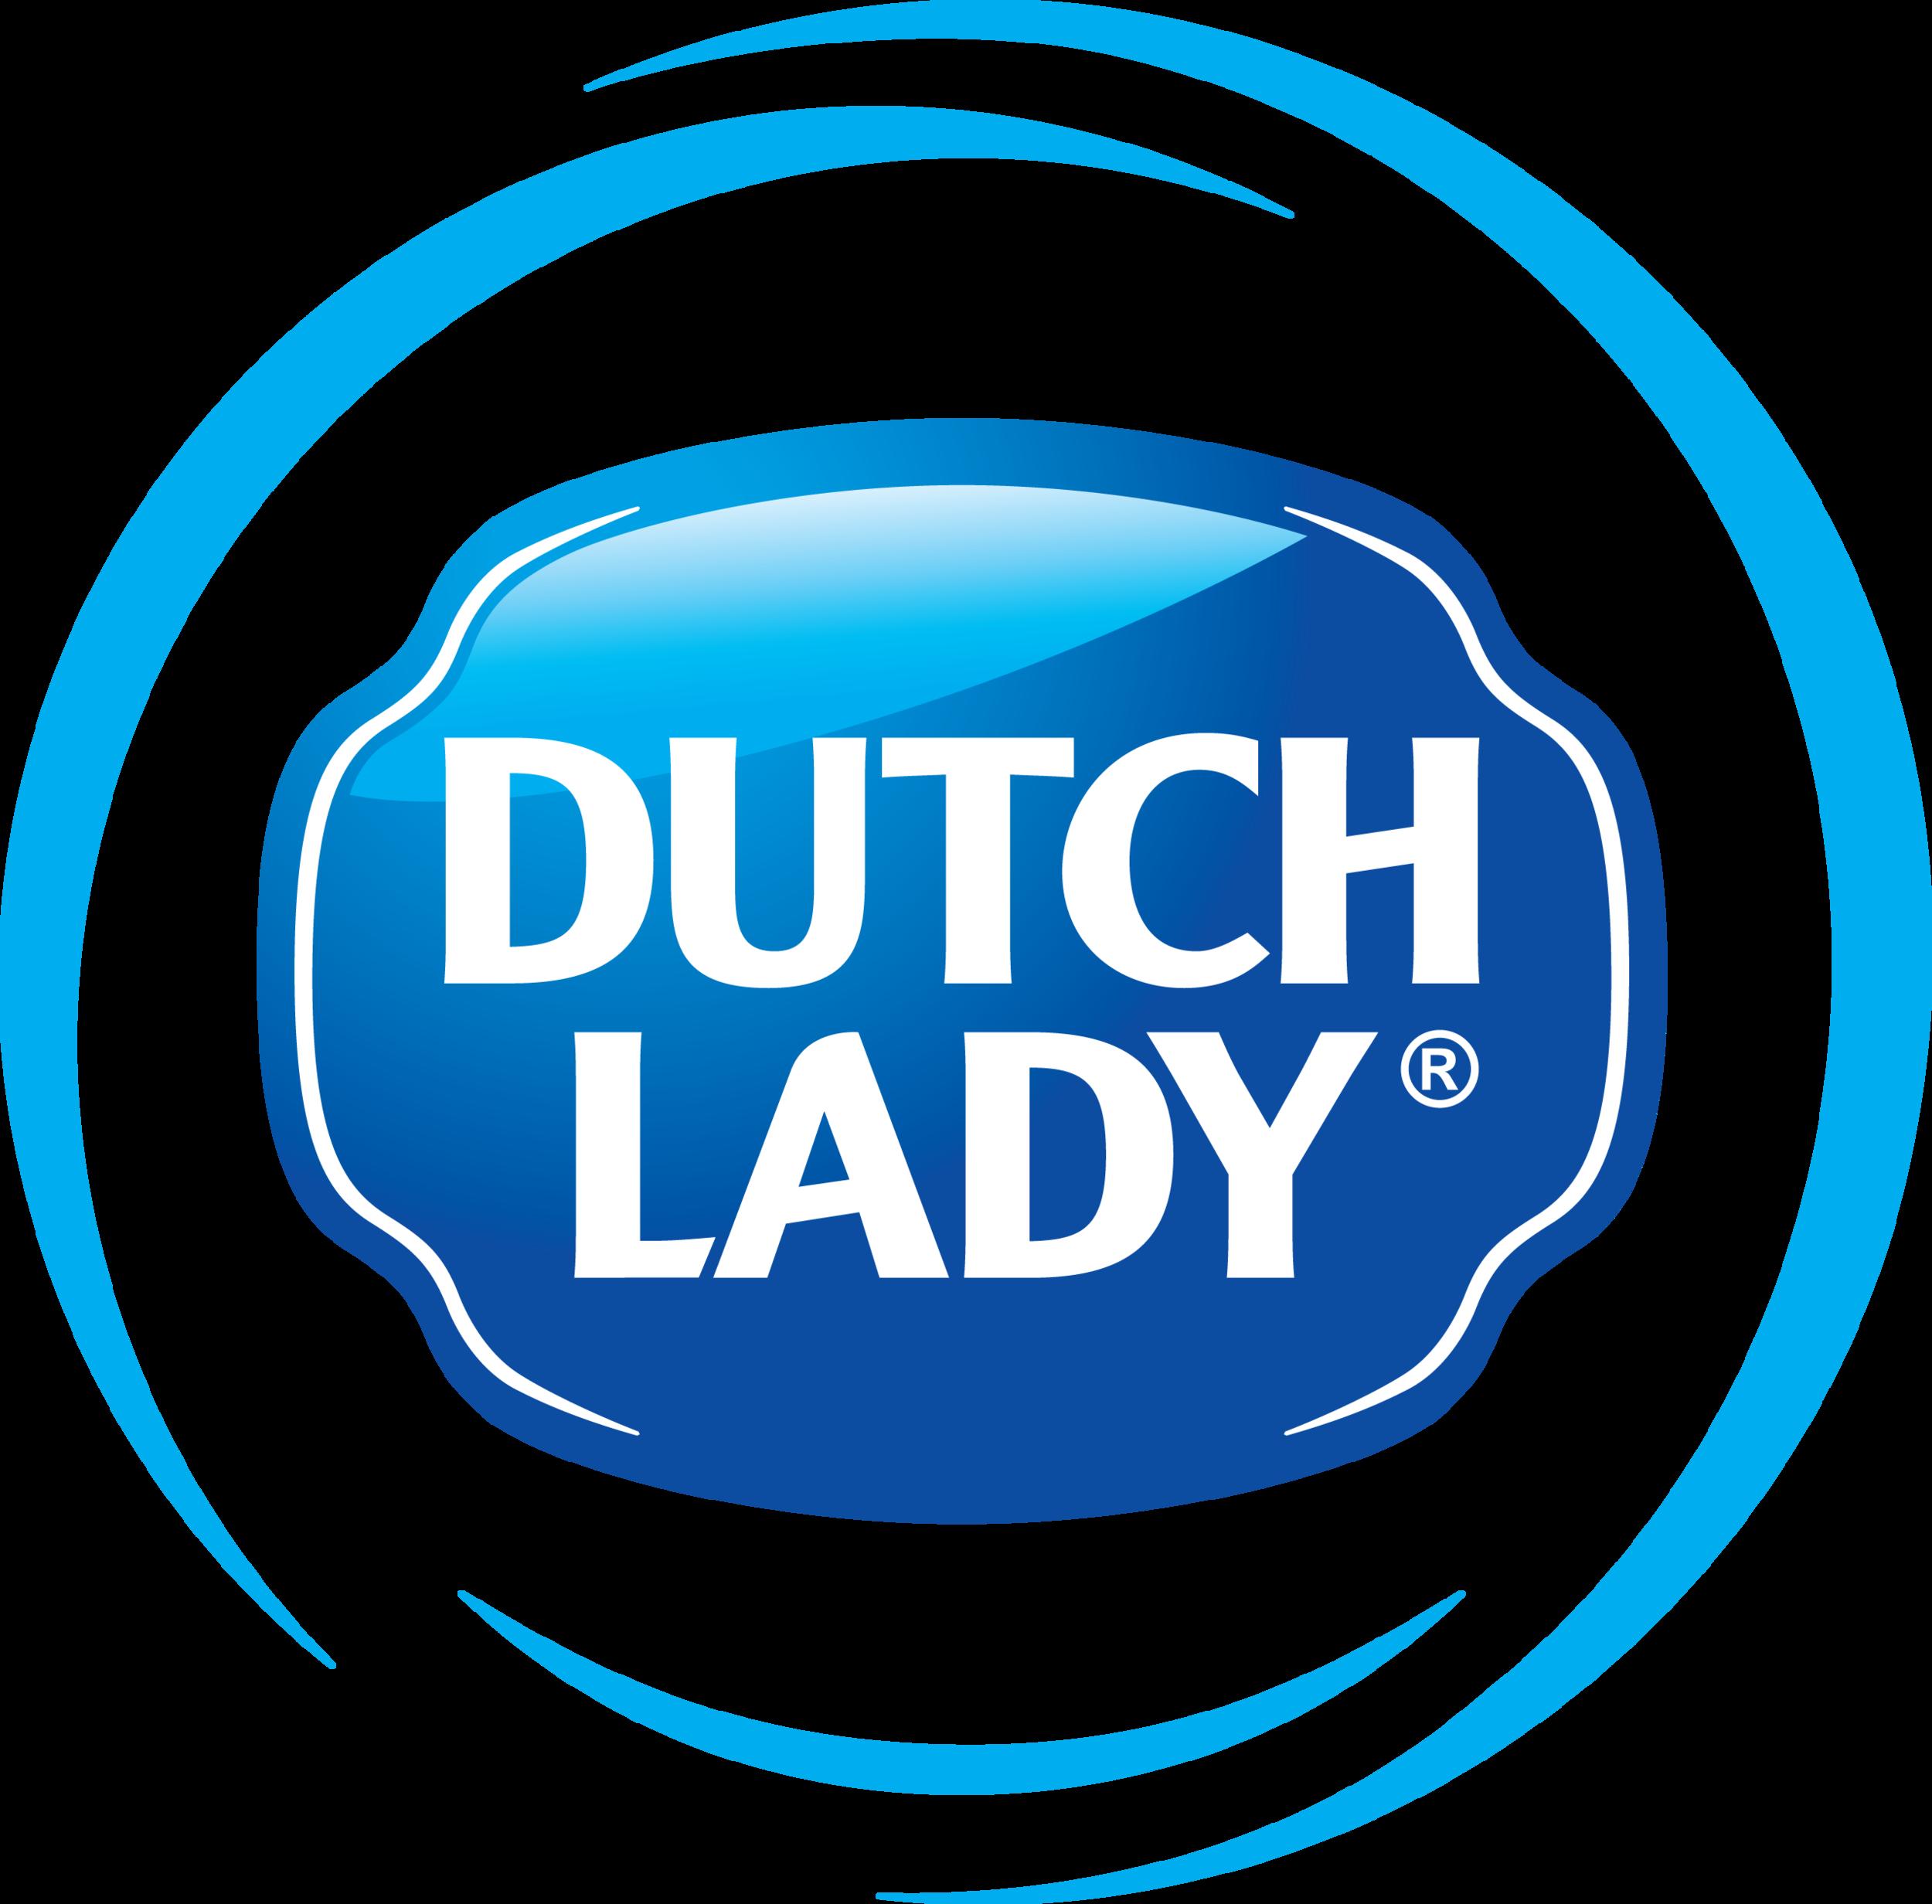 Dutch_Lady_2009.png